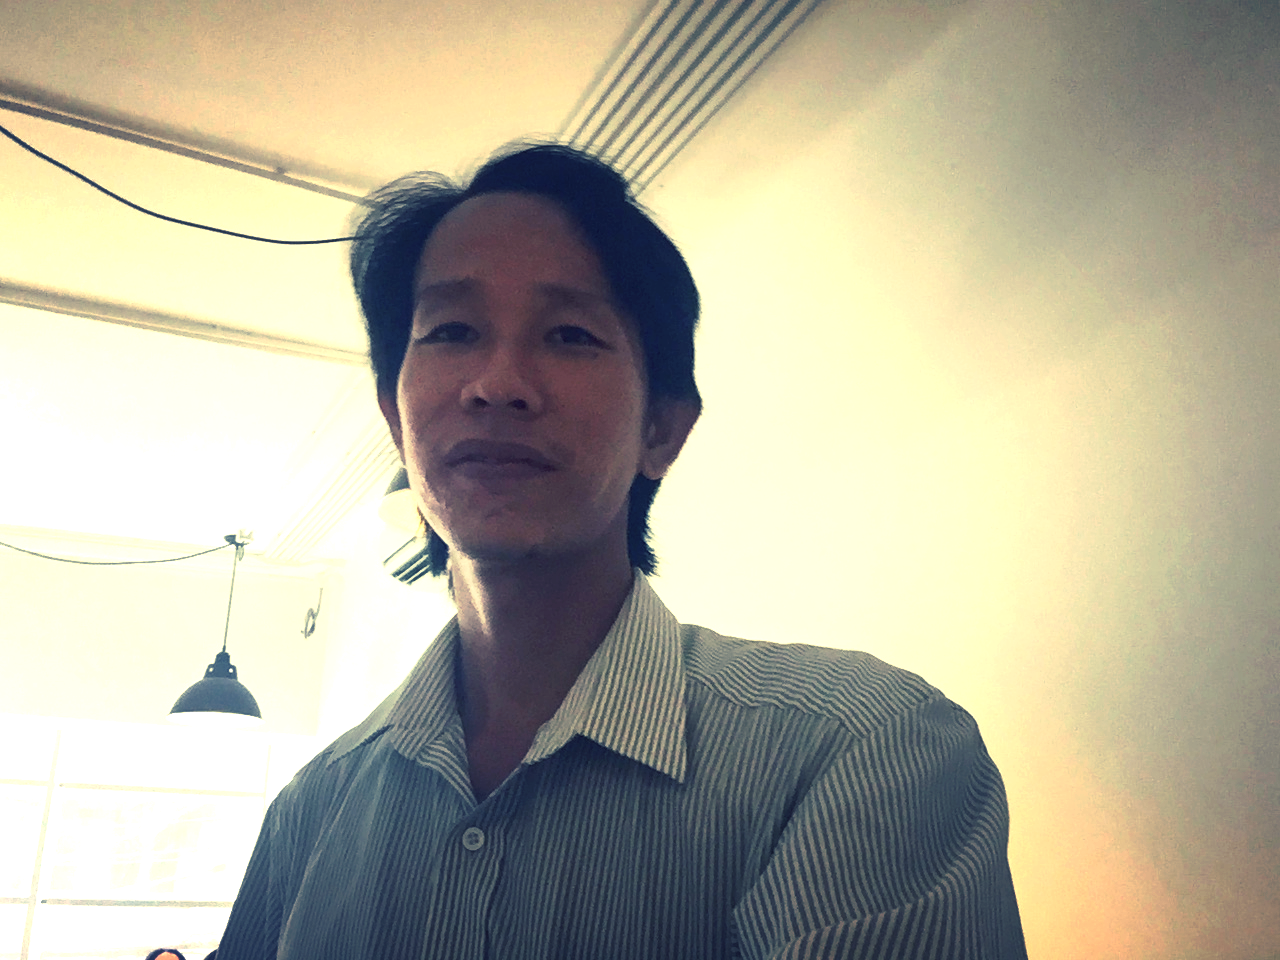 Le Thanh Vinh